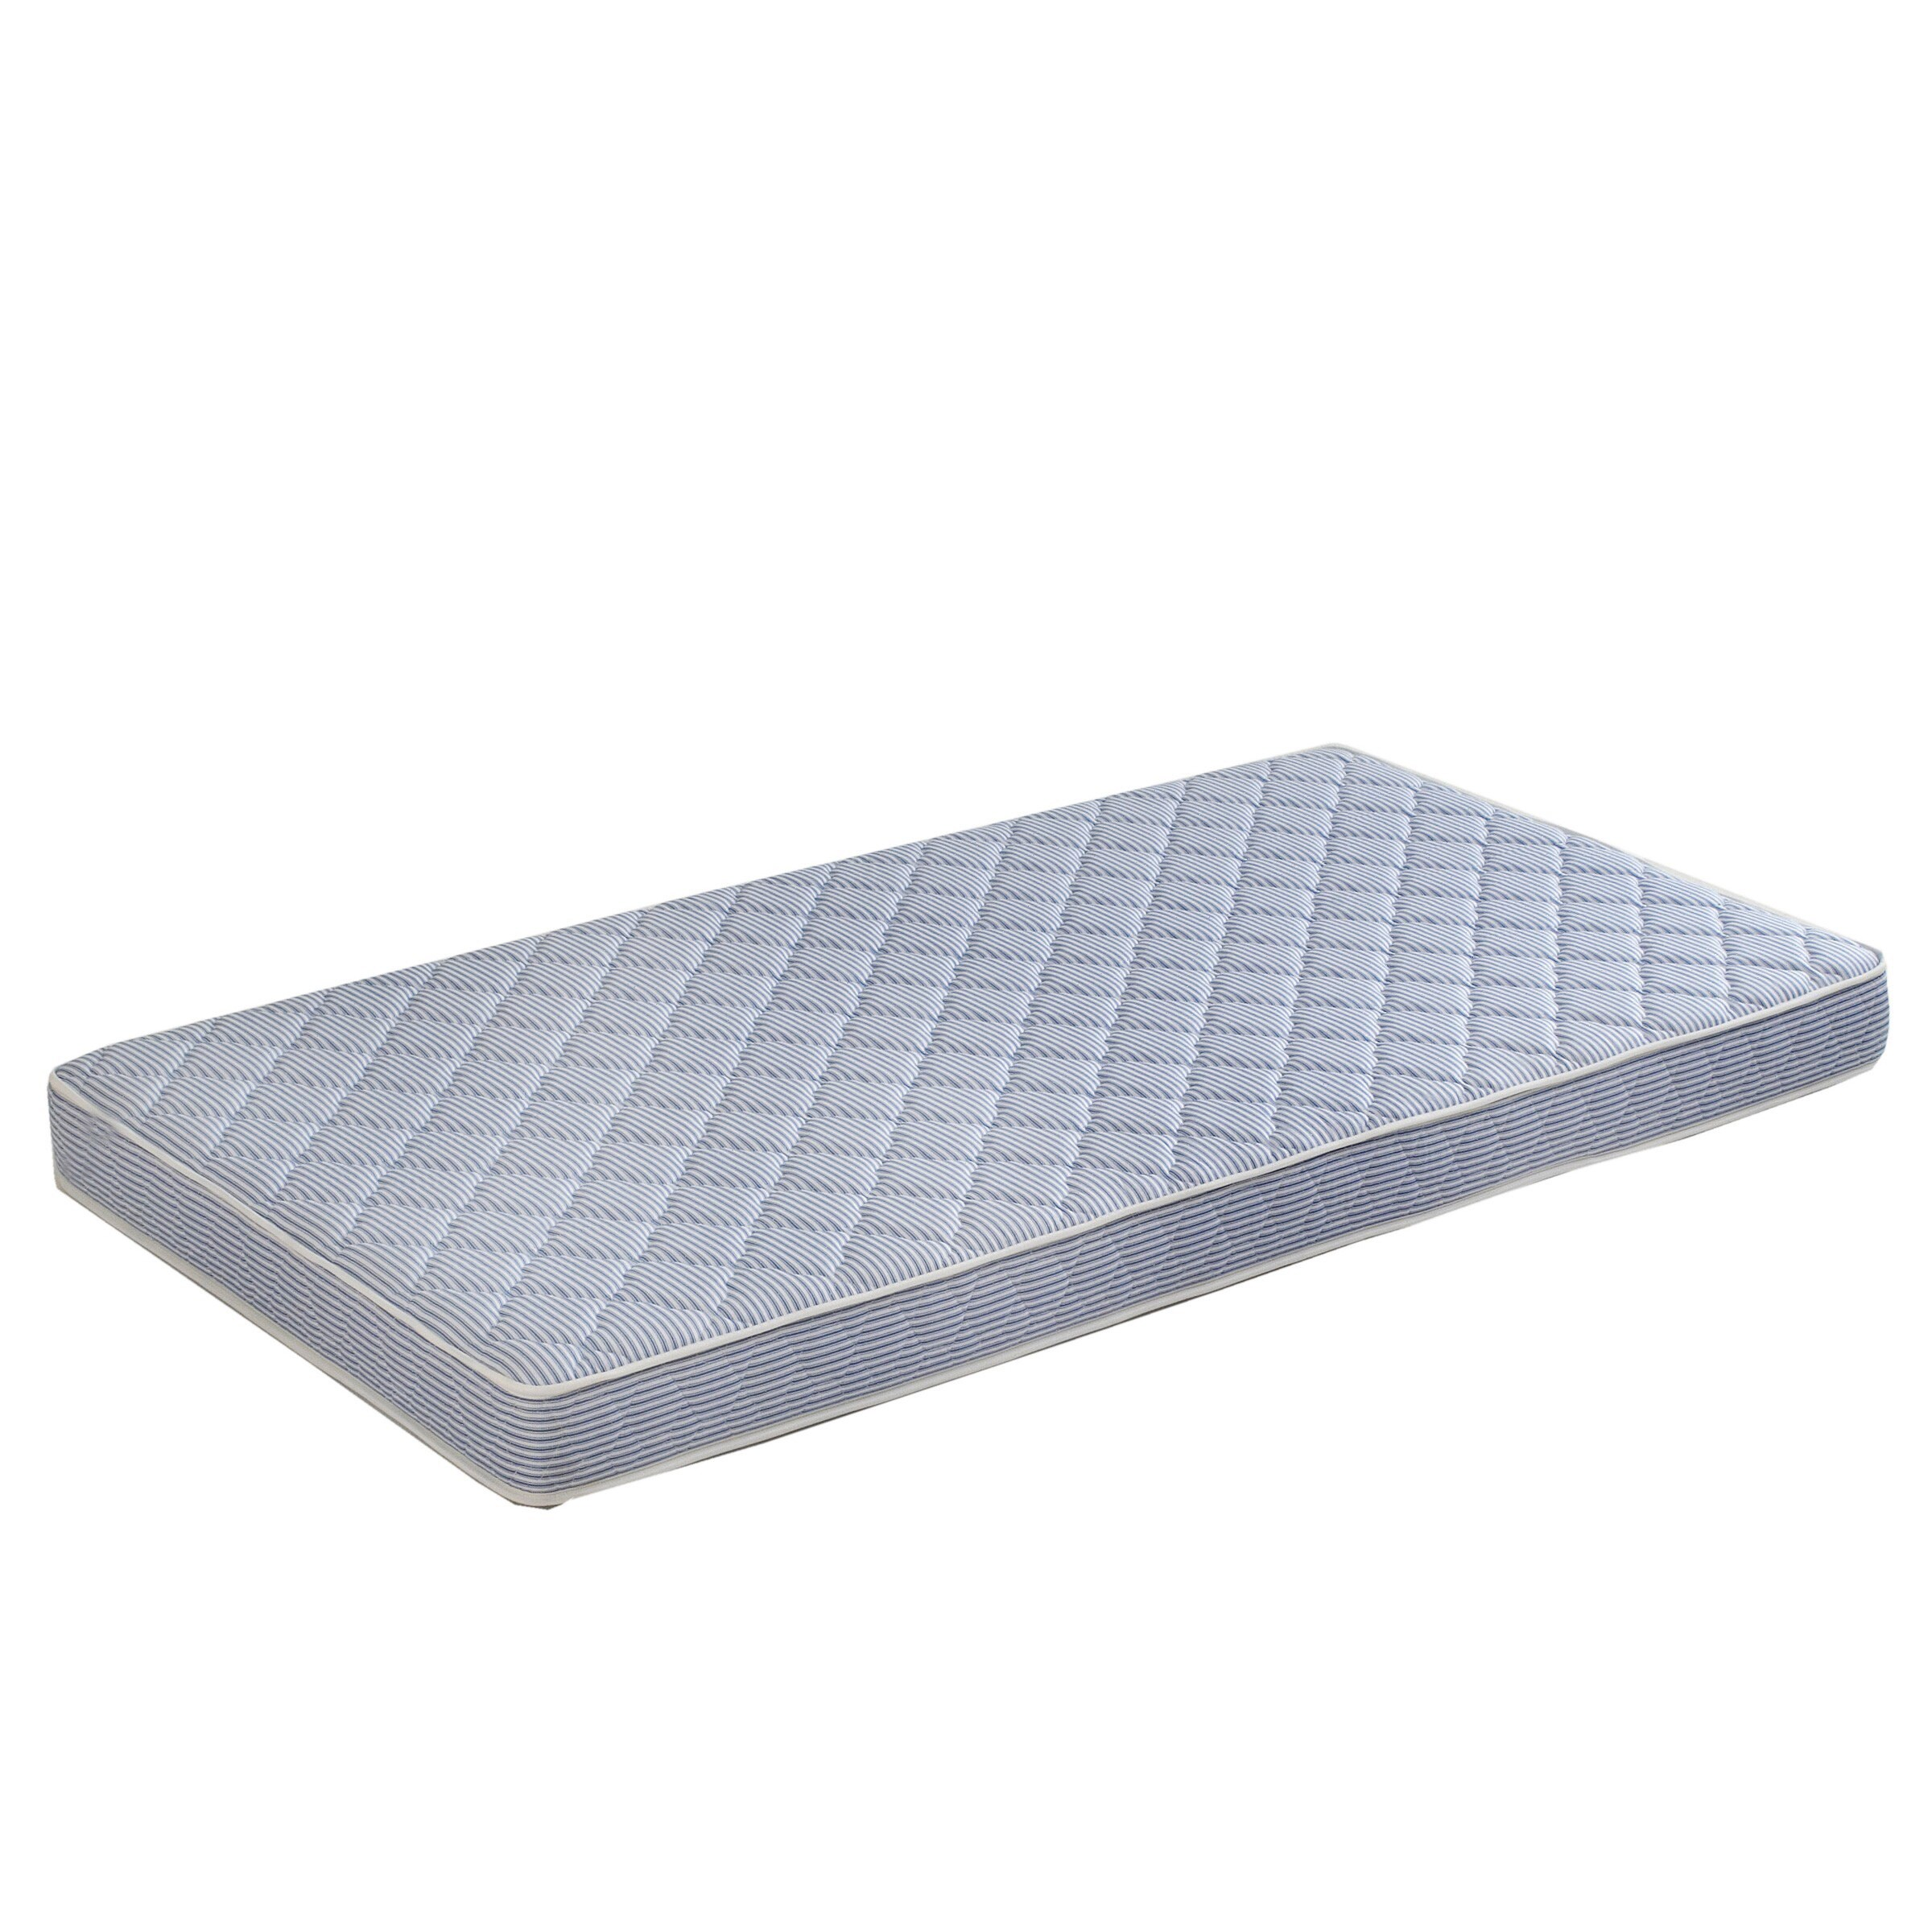 Innerspace 5 5 Inch 3 4 Size Rv Camper Foam Mattress Overstock 10202453